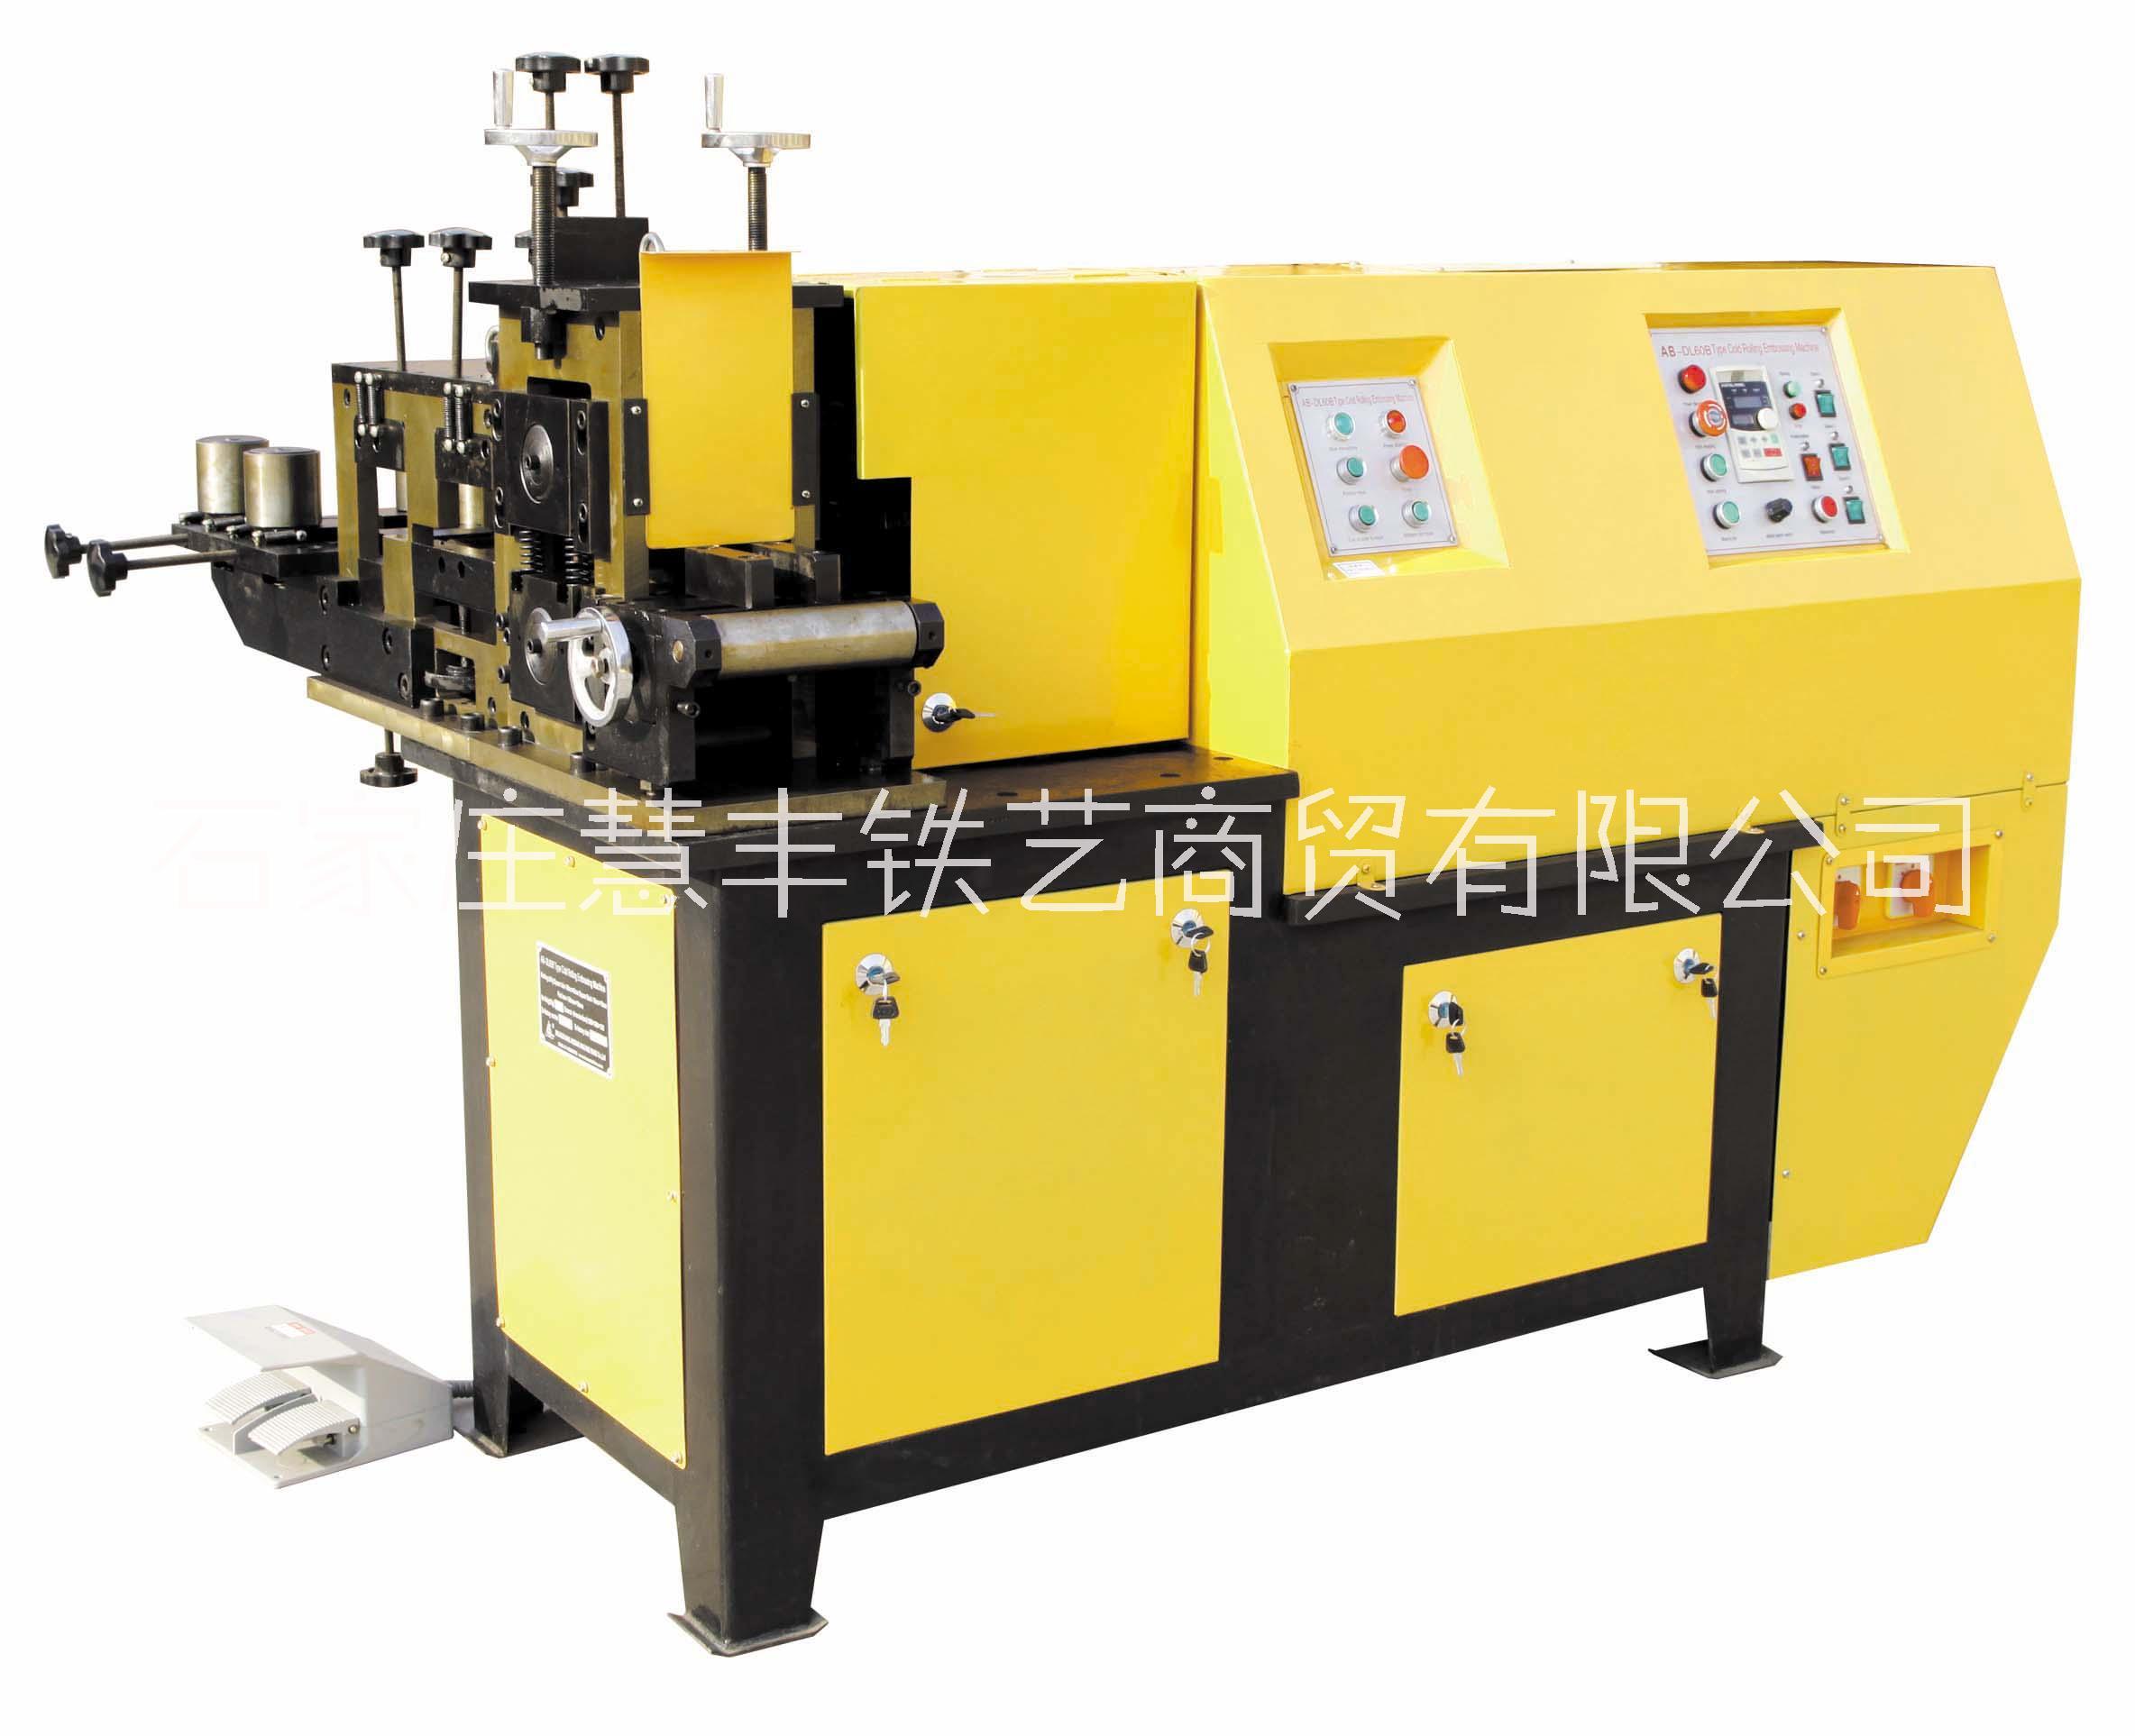 DL60B冷轧压花机,电动铁艺设备,铁艺机器